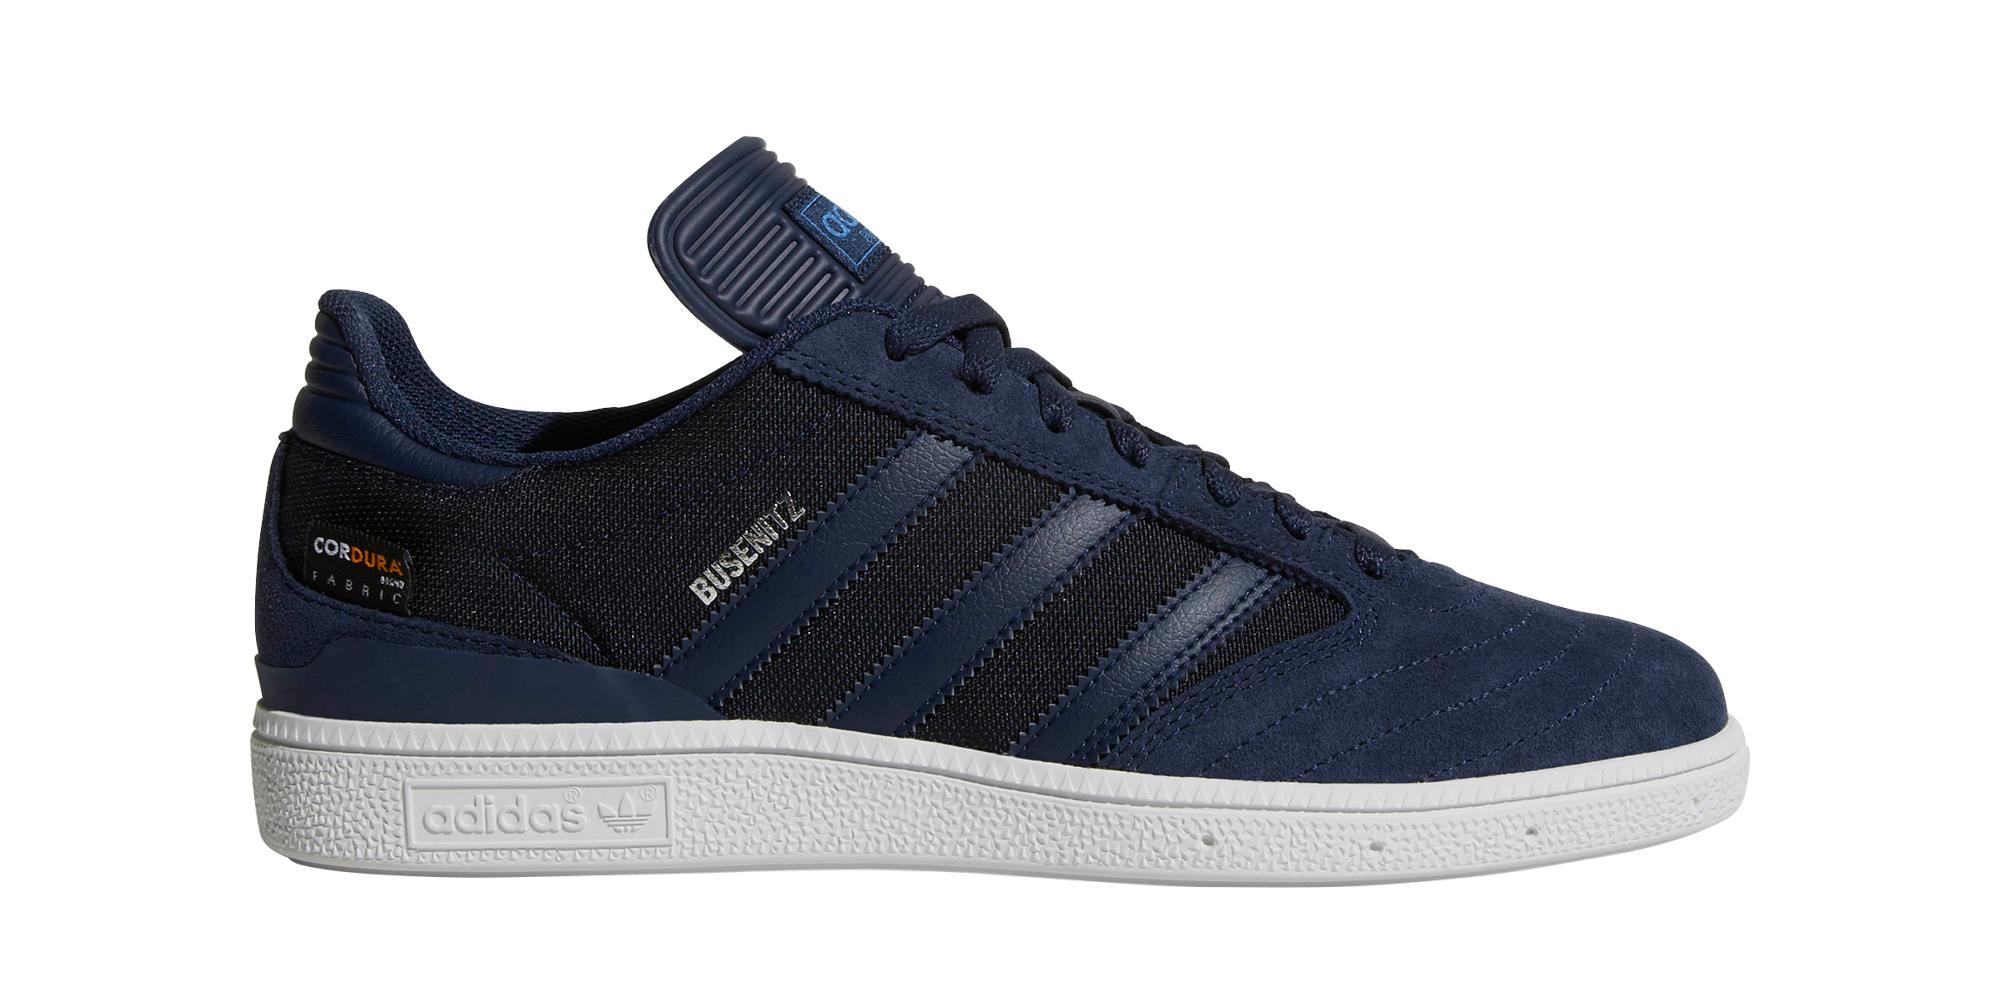 newest collection 489f9 5634e ... shoes 3330d 3bba5  hot adidas skateboarding busenitz dennis busenitz  pro modello skate 0def5 a2554